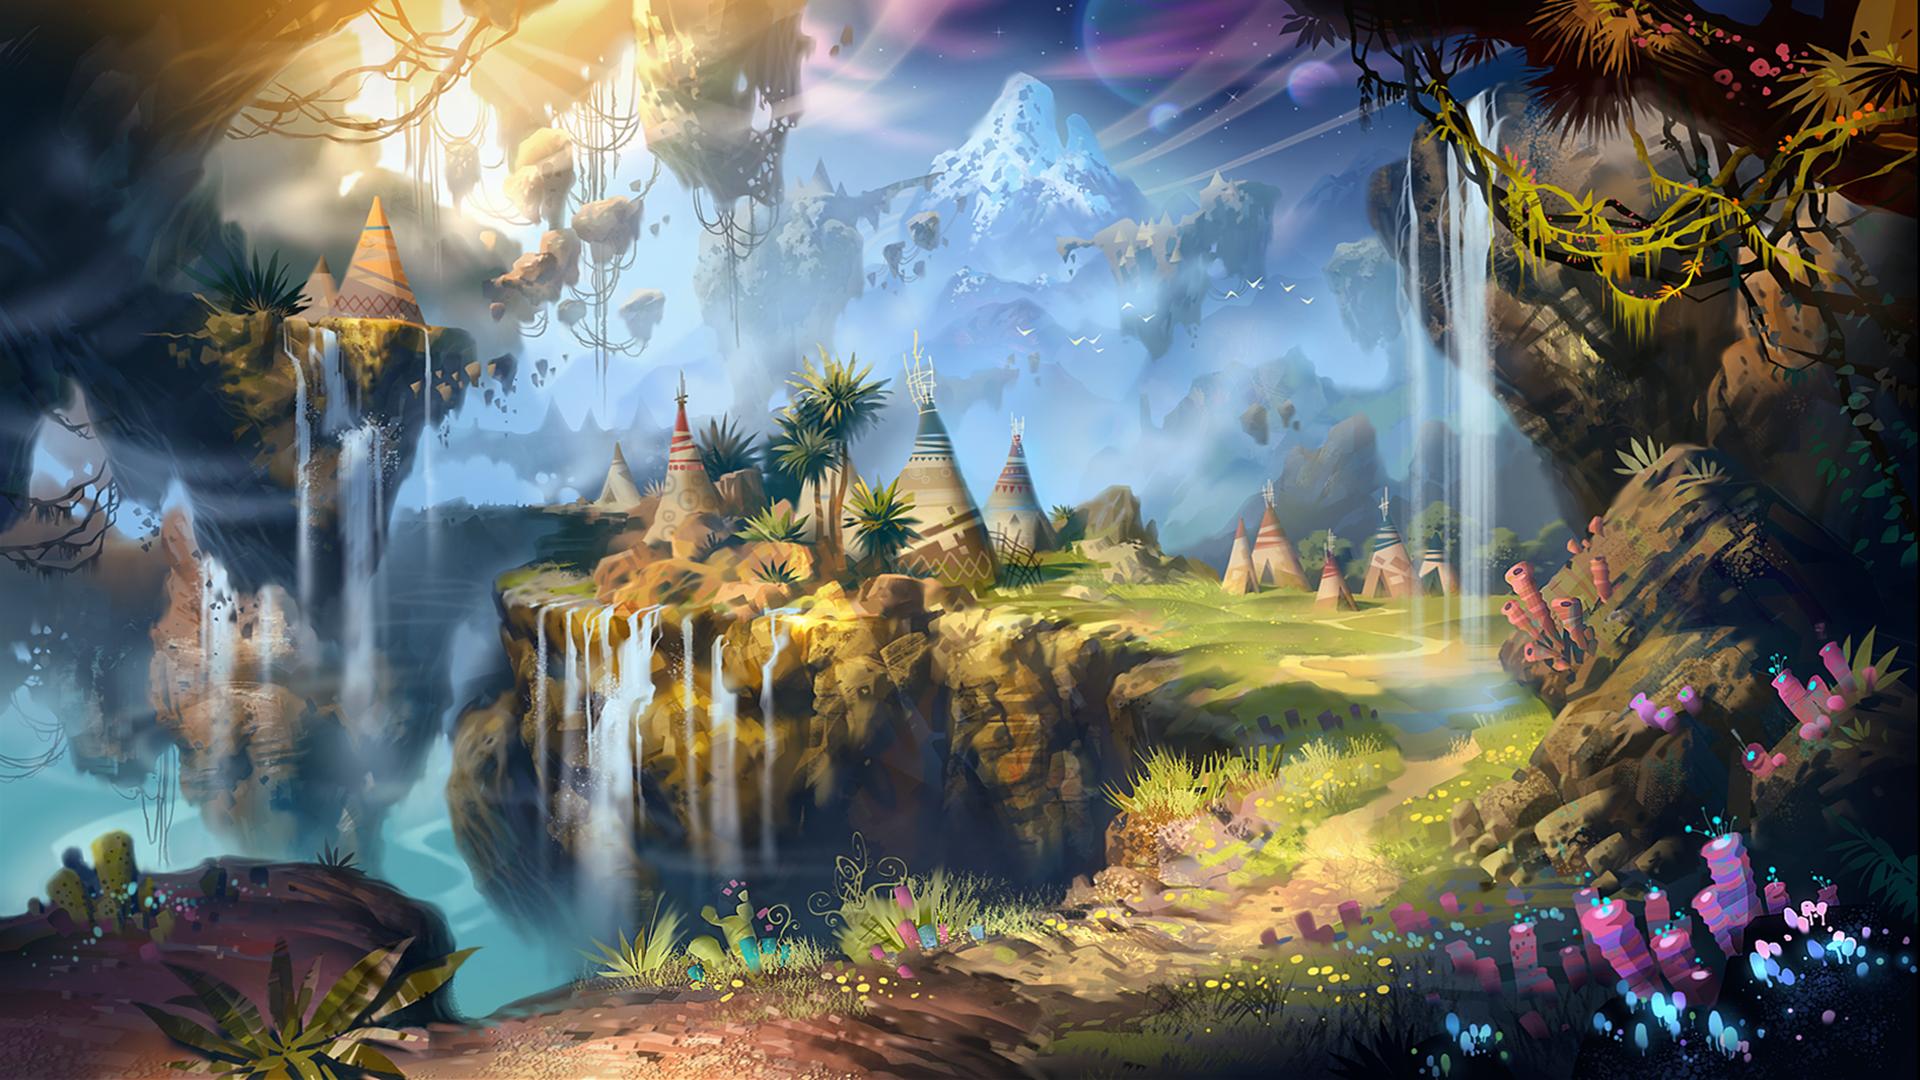 Landscape computer wallpapers desktop backgrounds - Fantasy desktop pictures ...